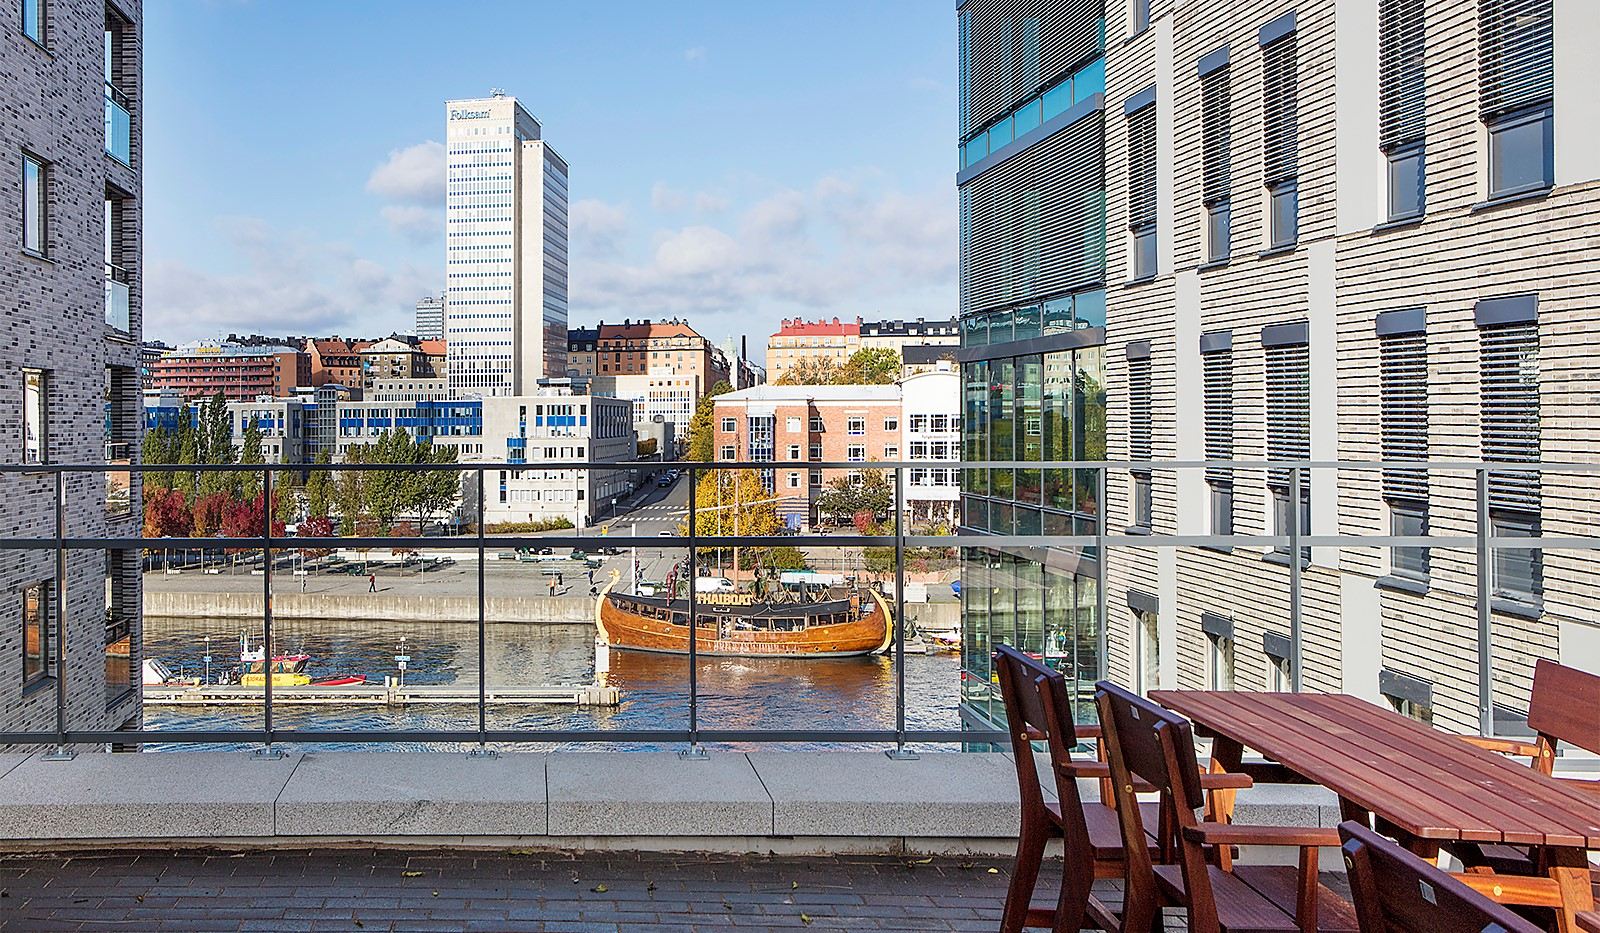 Fredriksdalsgatan 24, vån 2 - Från gården bjuds trevlig Kanalutsikt